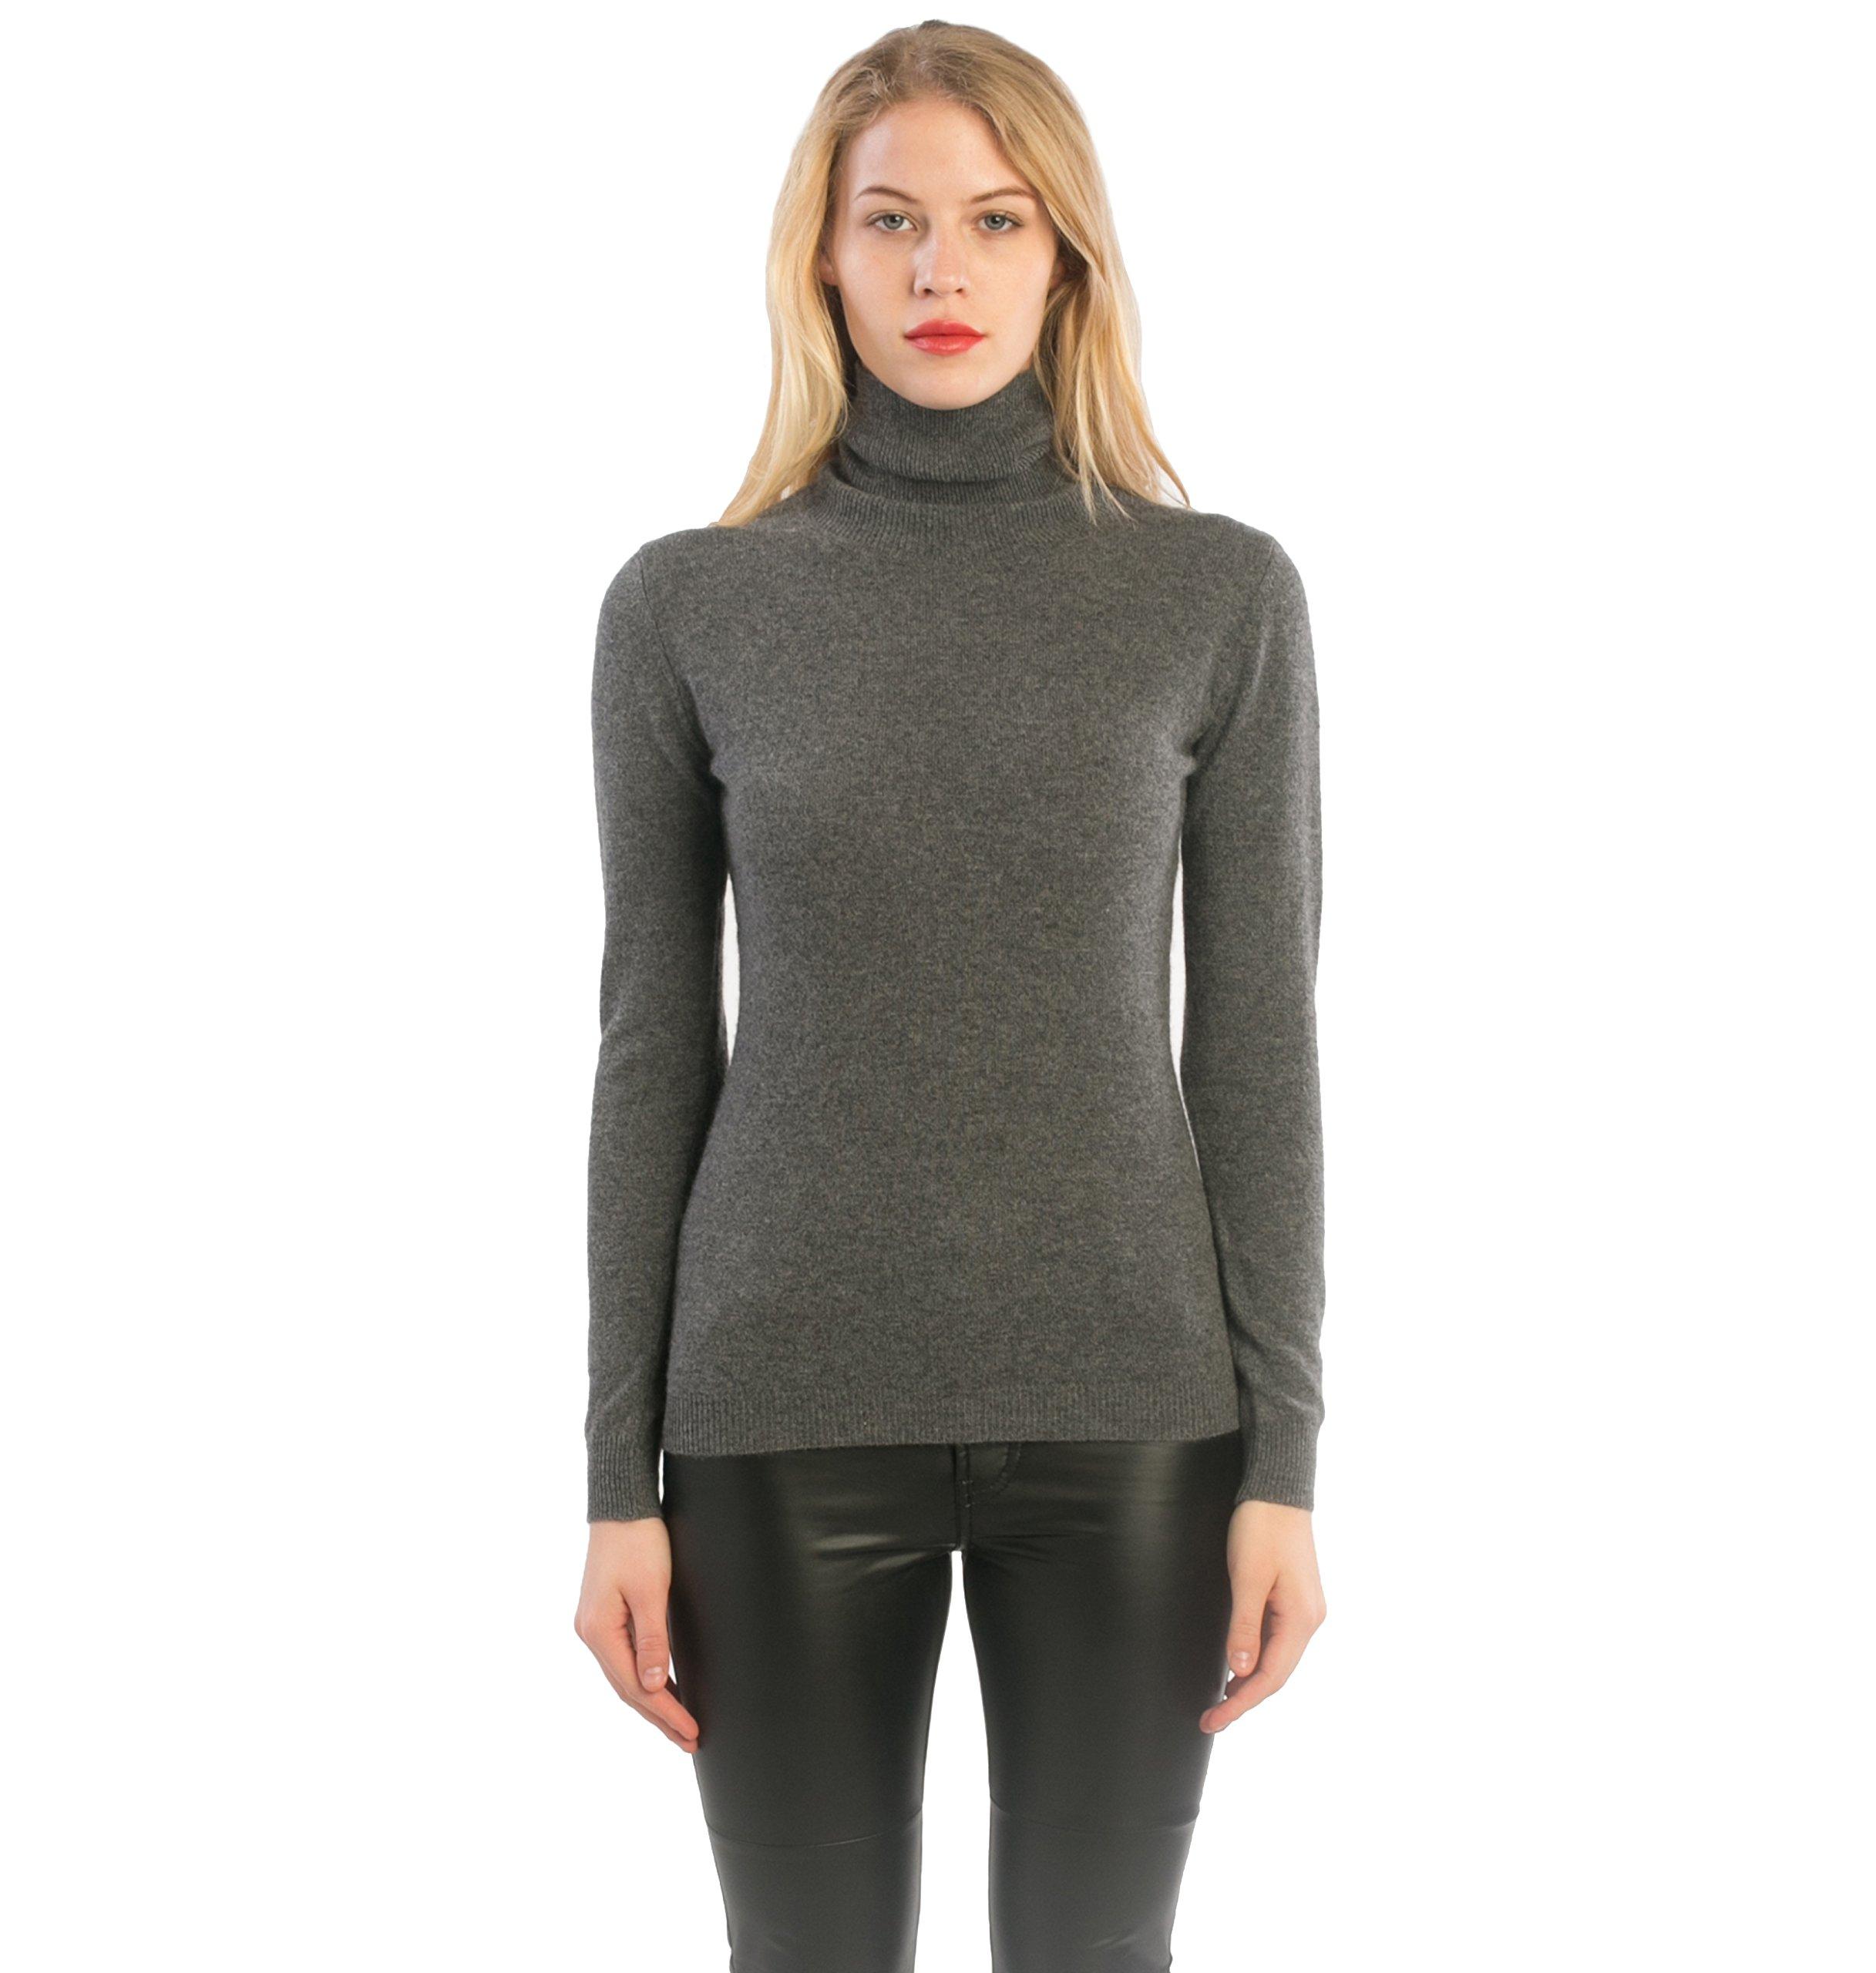 cashmere 4 U 100% Cashmere Turtleneck Sweater Pullover For Women